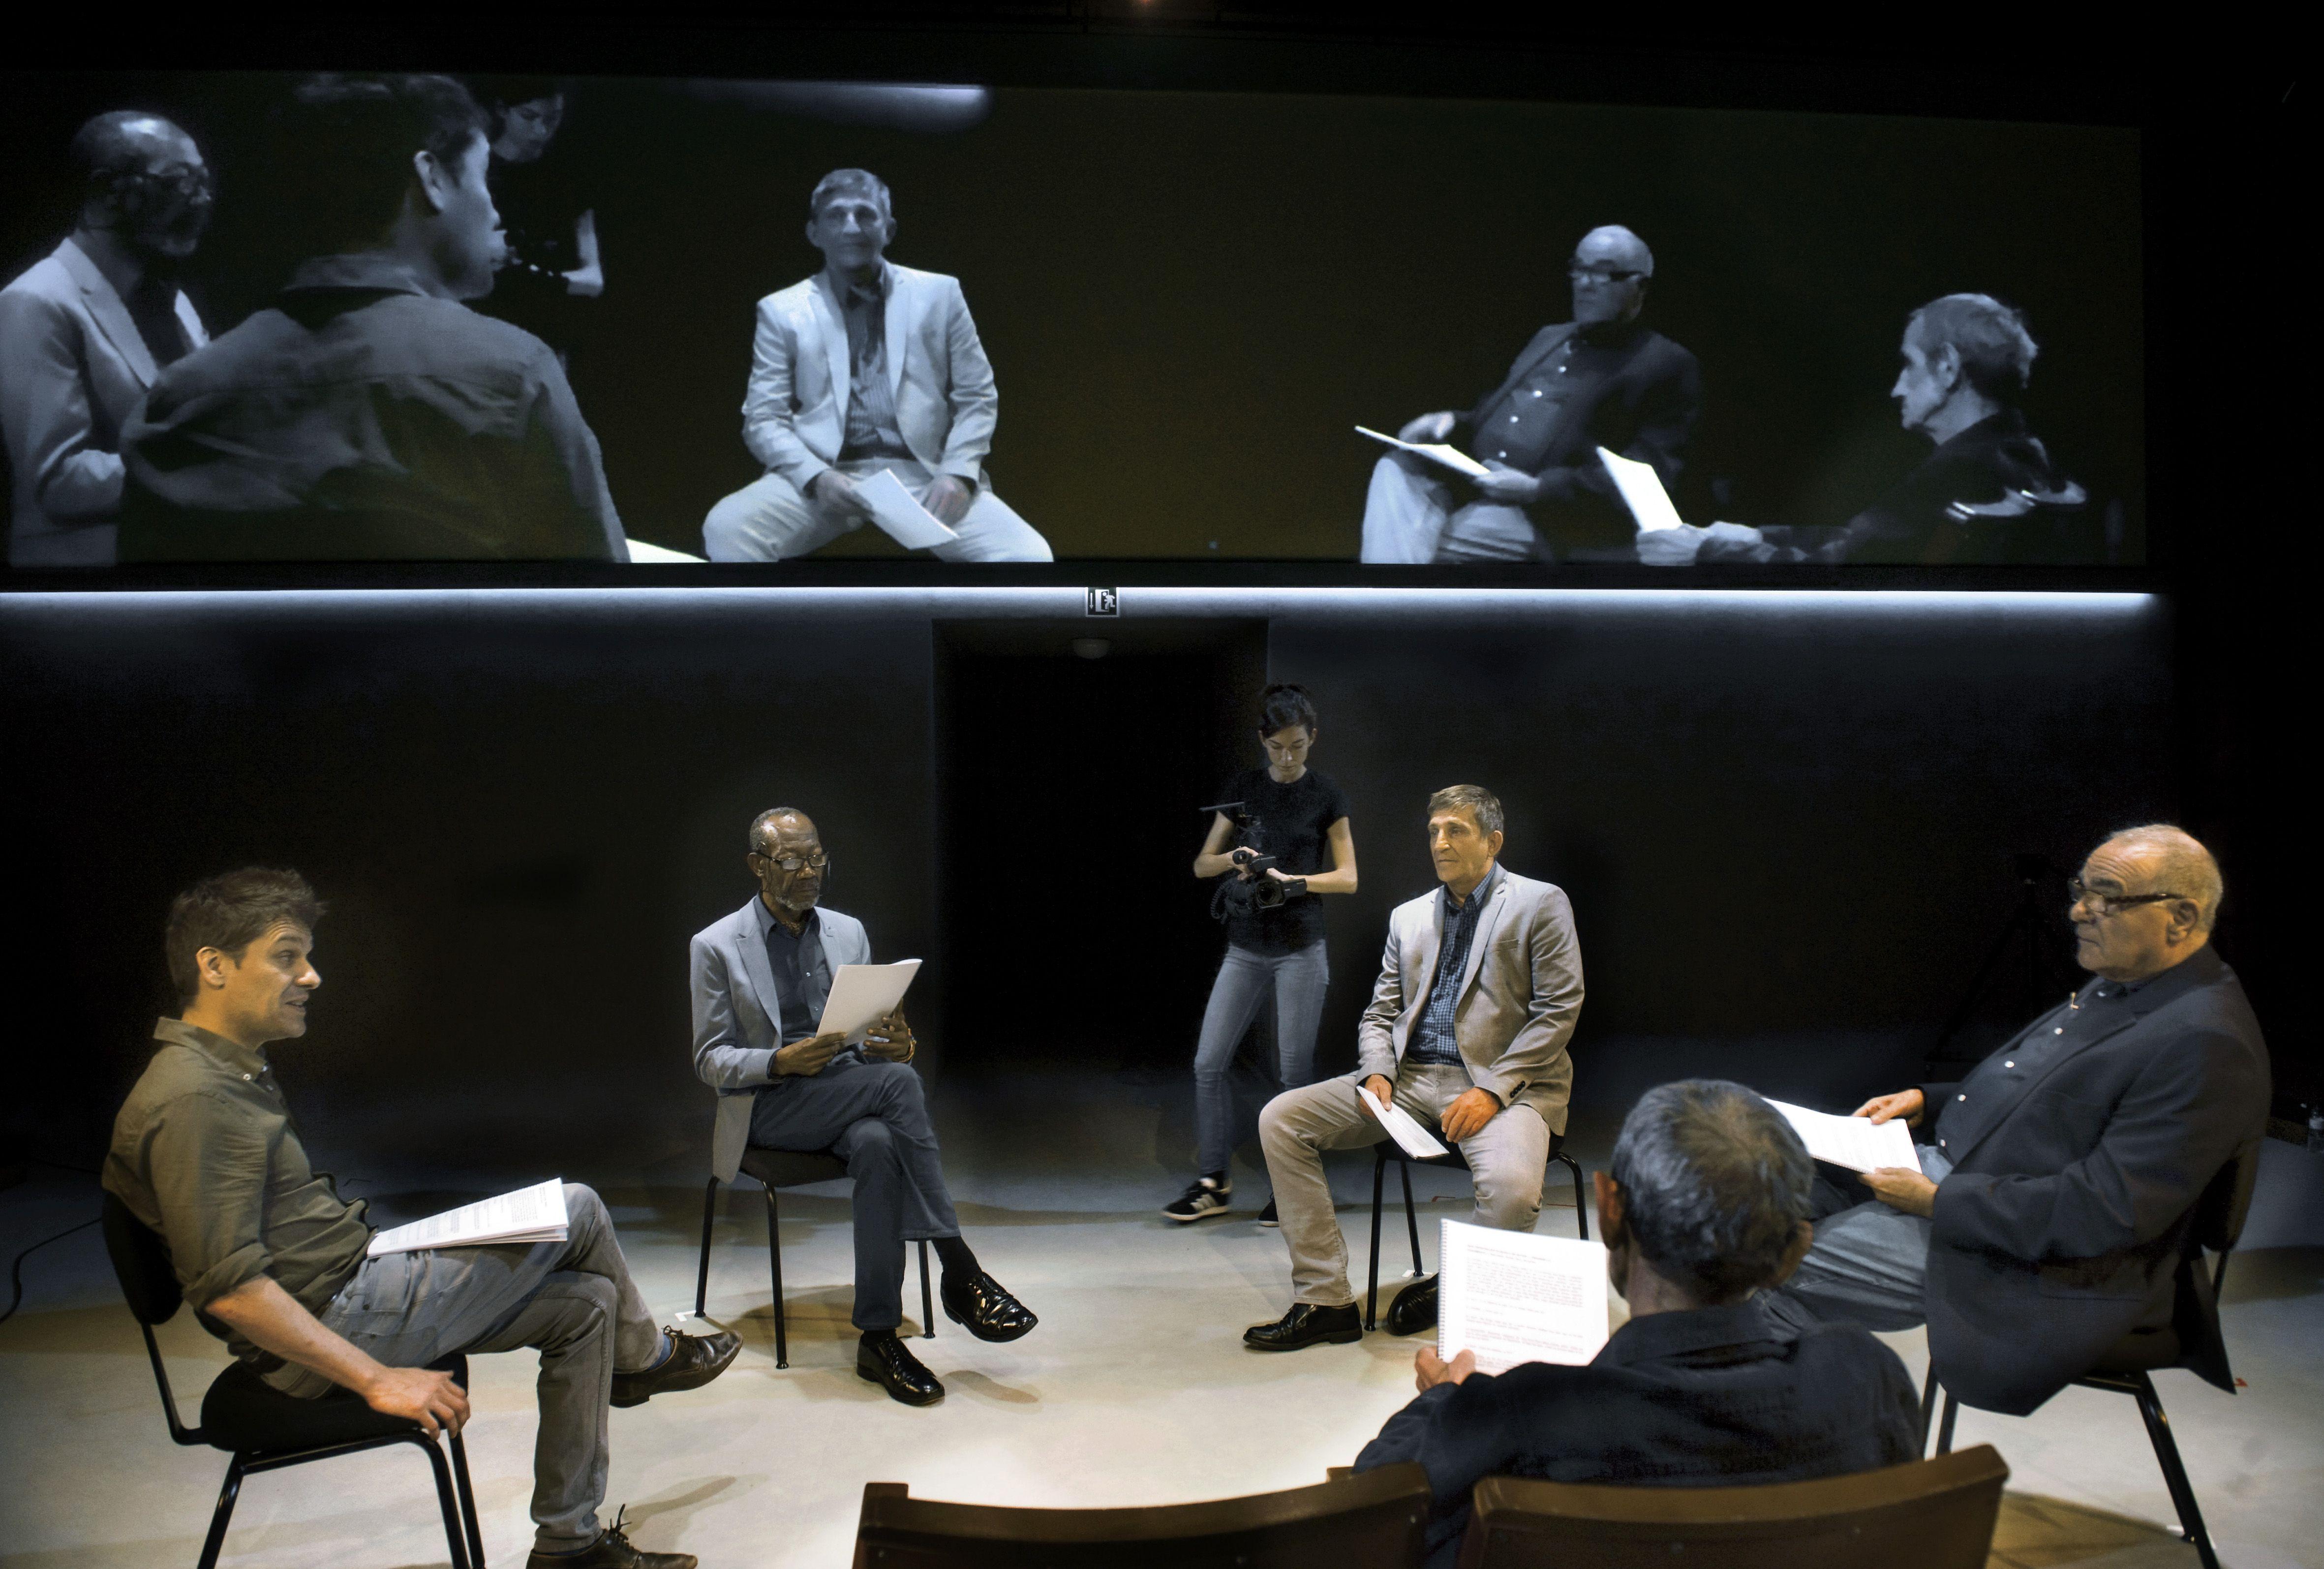 Sis personatges - Homenatge a Tomás Giner - (c) Ros Ribas